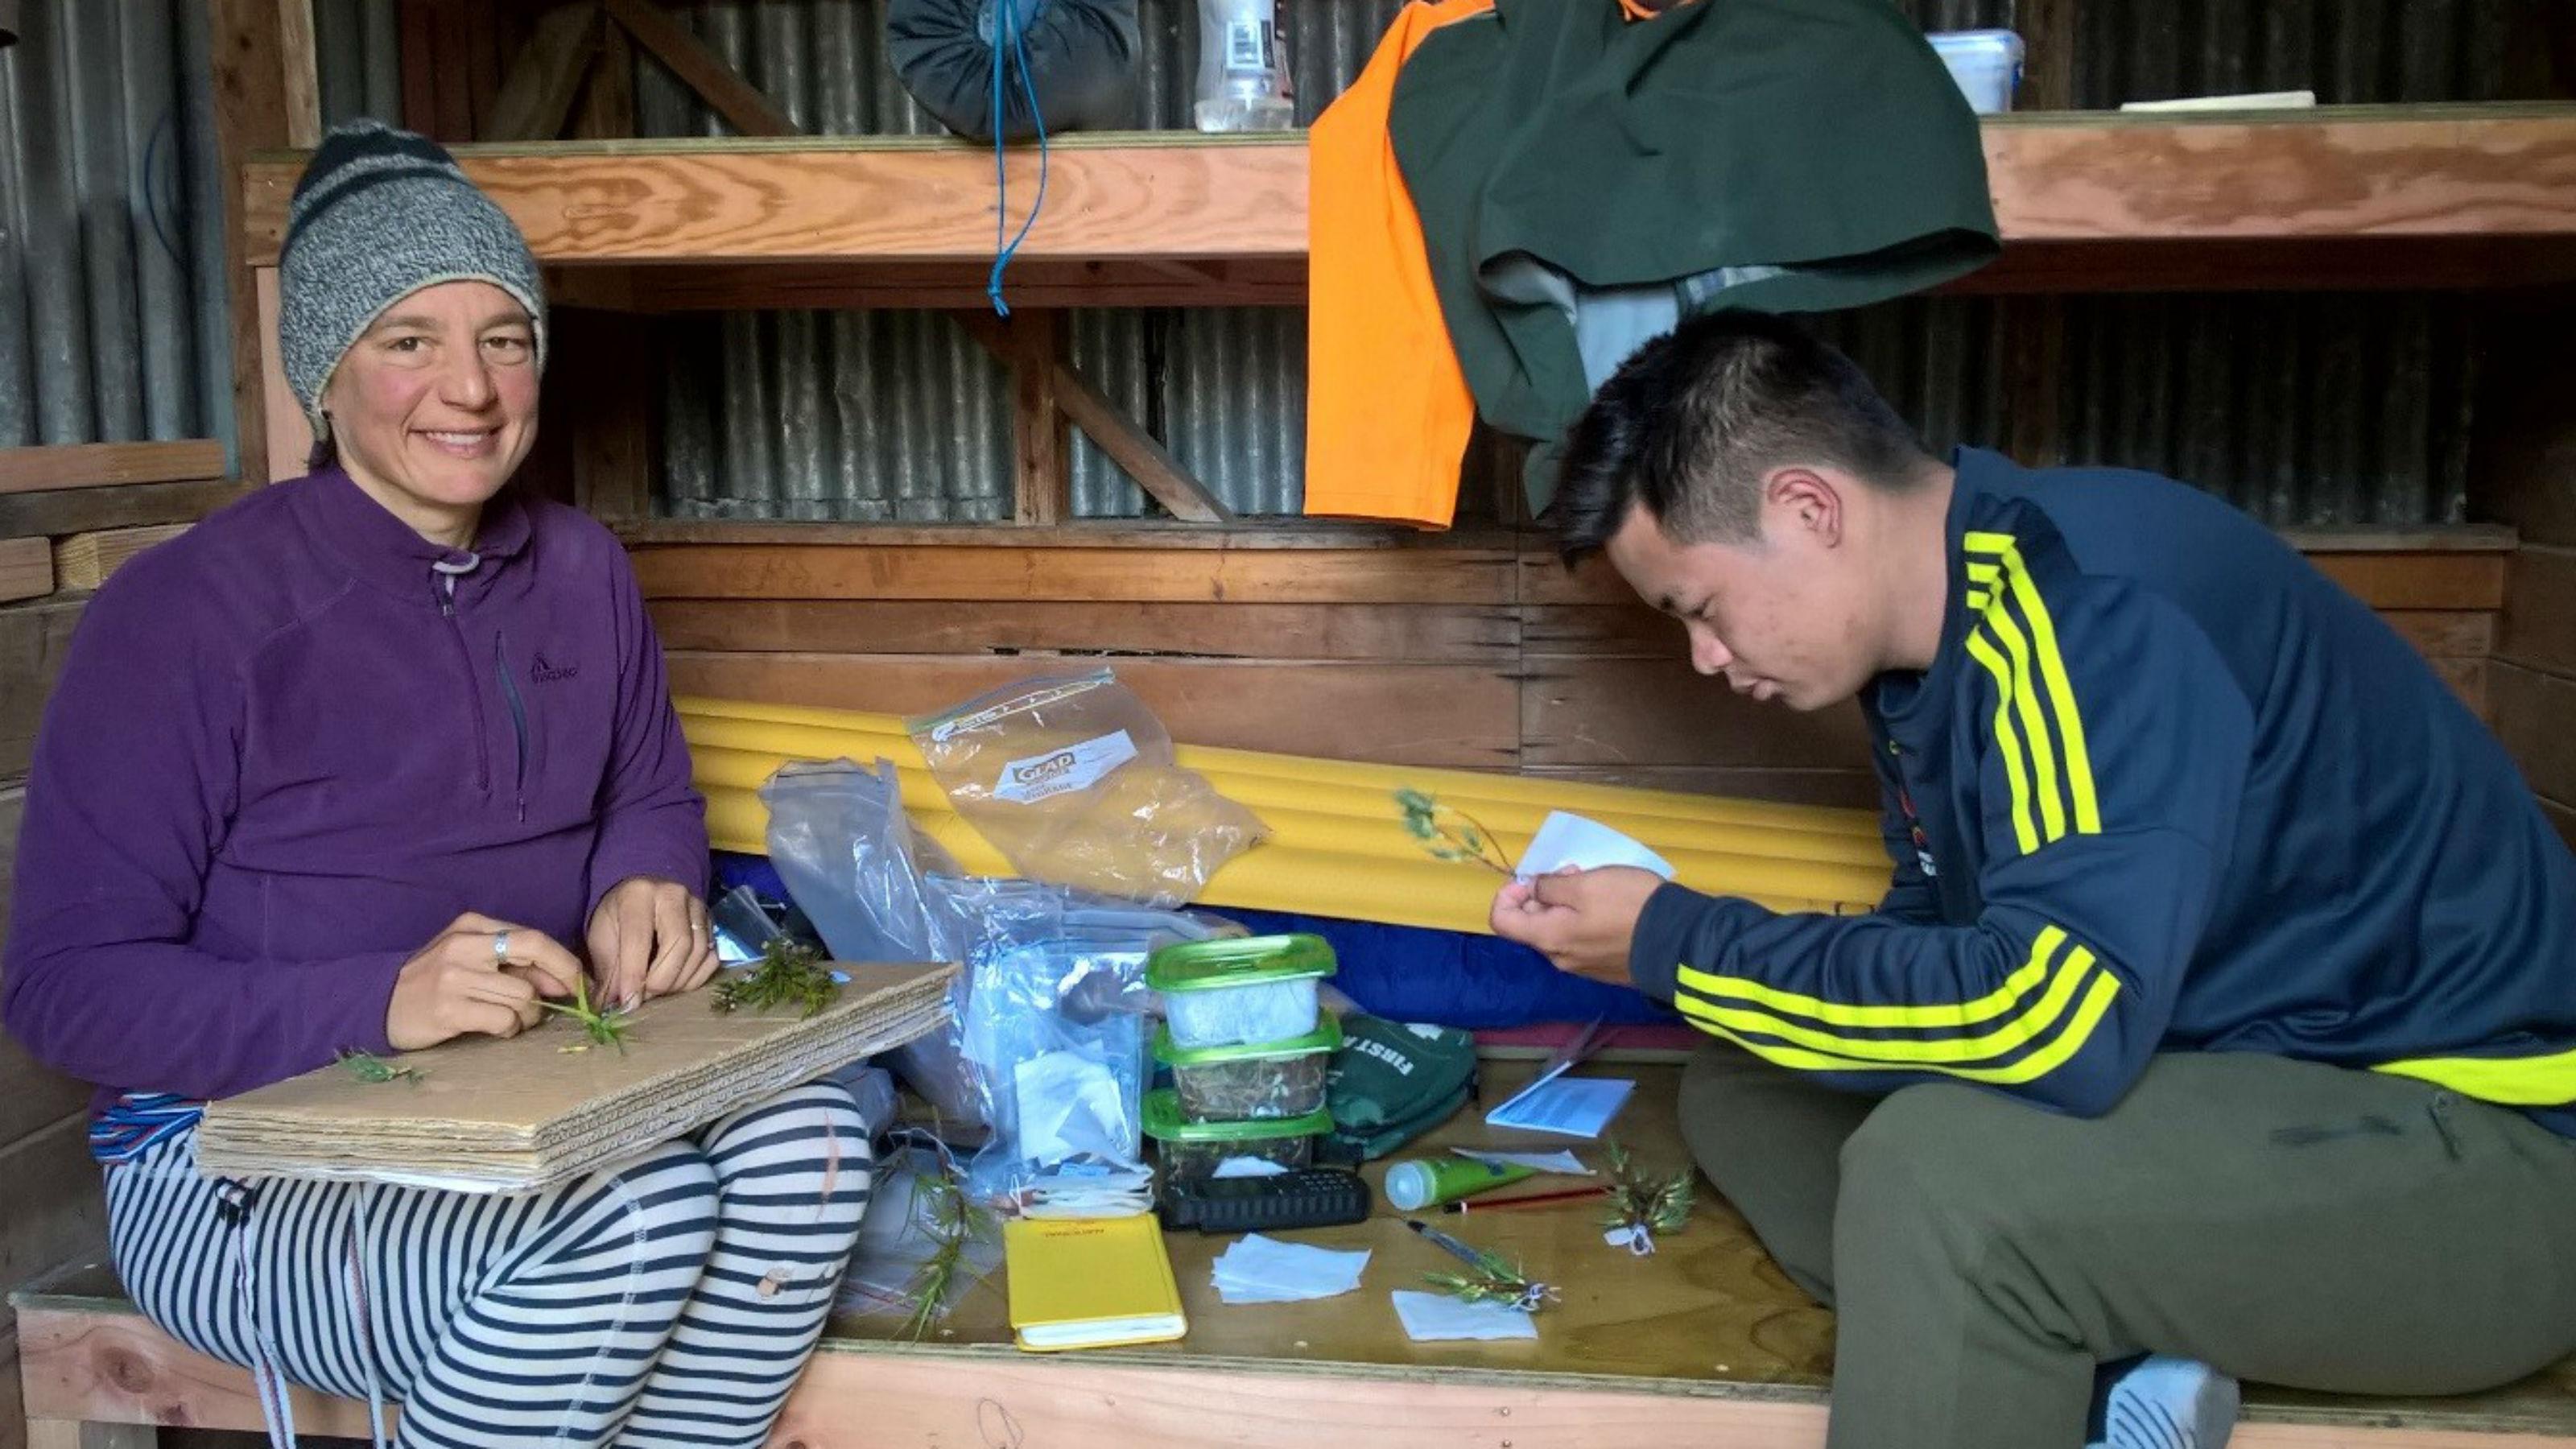 Te Papa Botanist Heidi Meudt and Justin Liu examining specimens in the field. West Coast, South Island, New Zealand